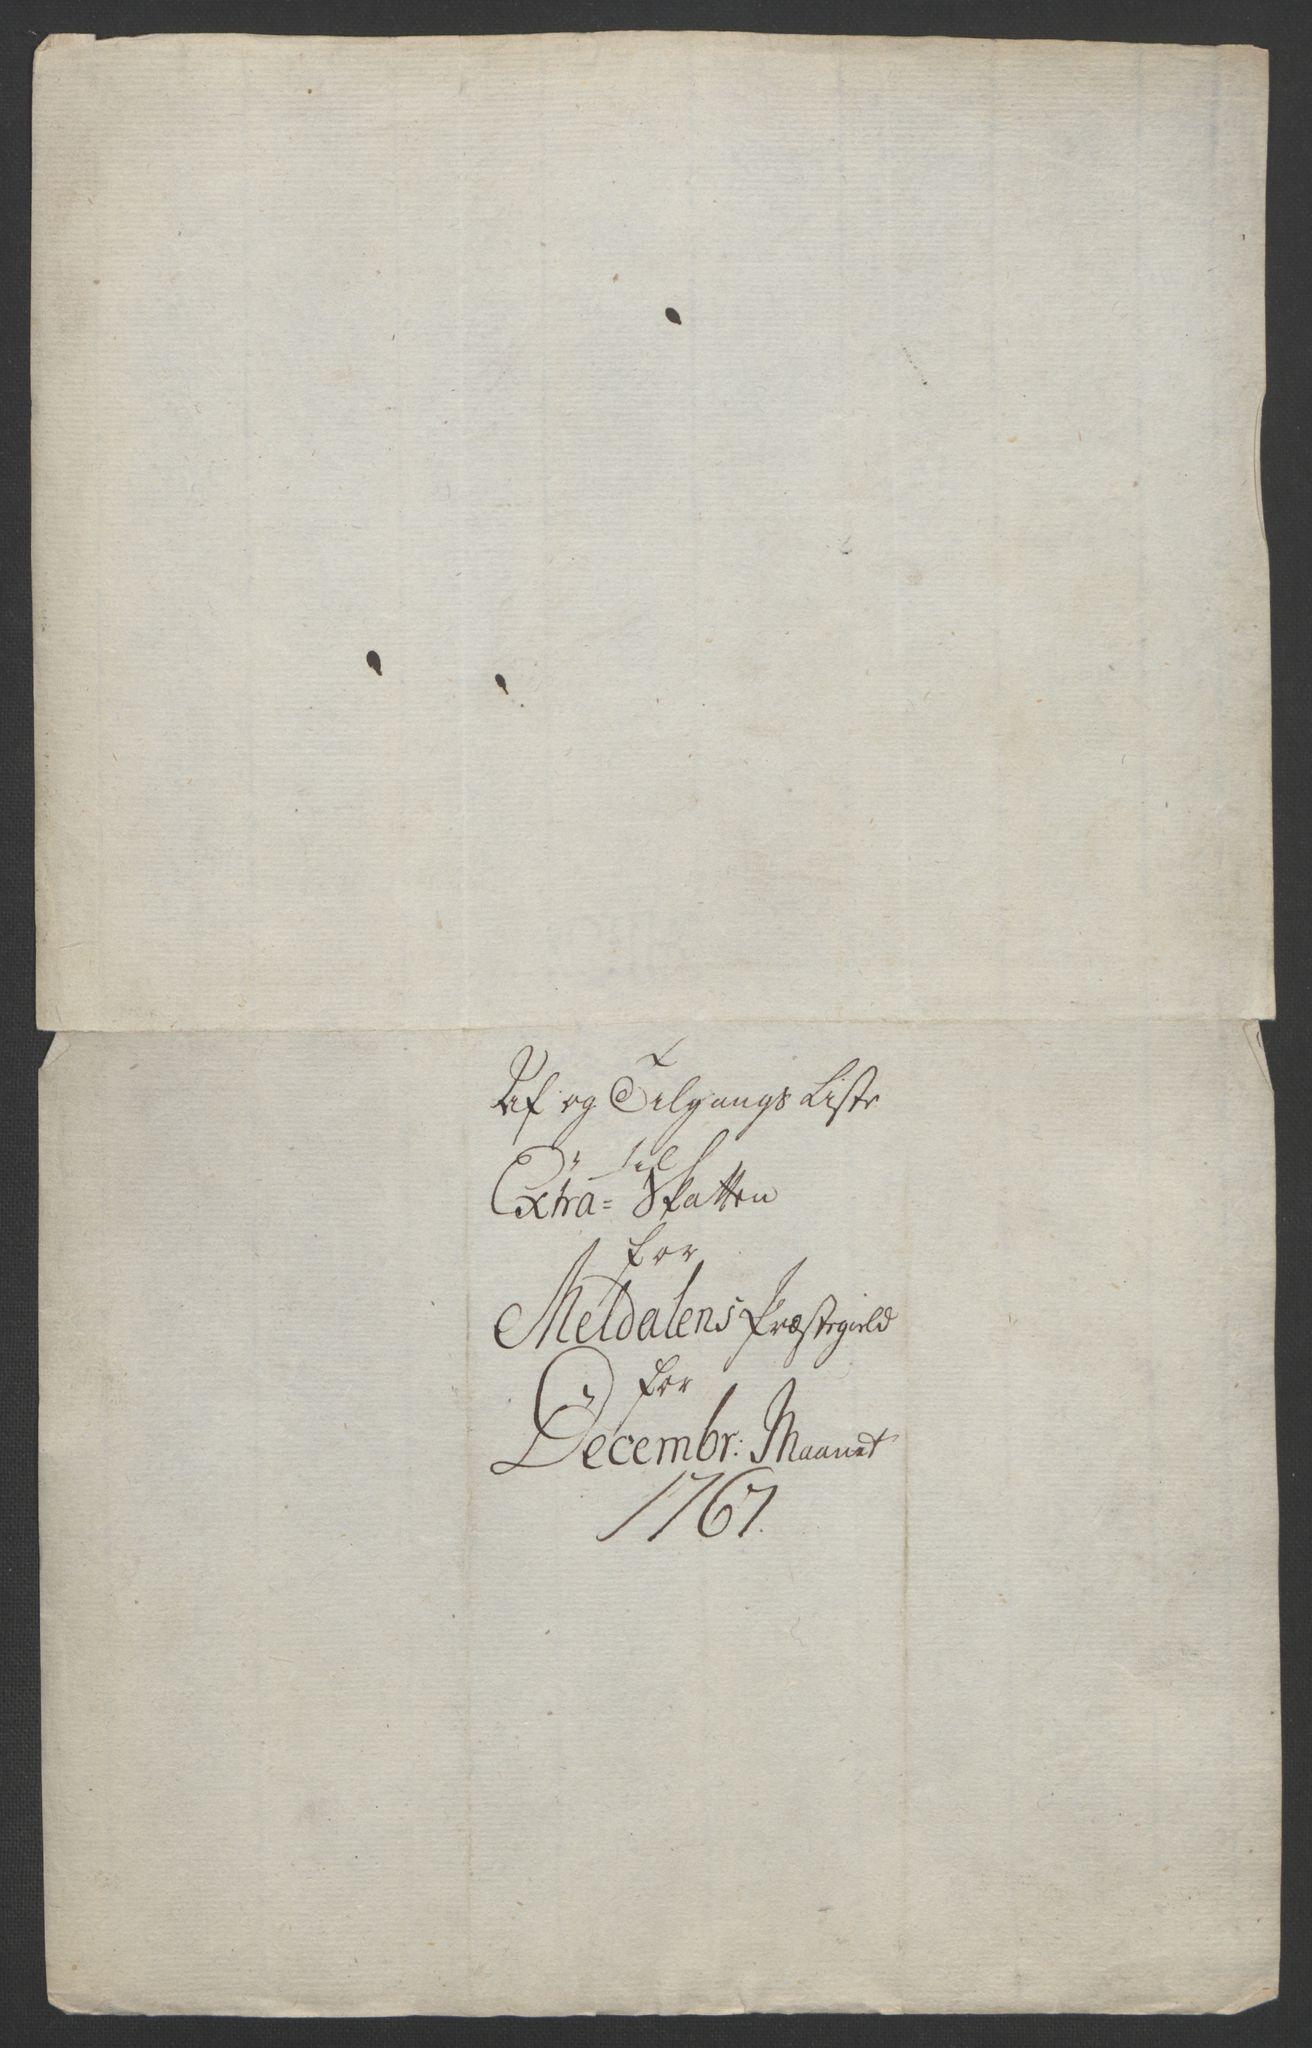 RA, Rentekammeret inntil 1814, Realistisk ordnet avdeling, Ol/L0021: [Gg 10]: Ekstraskatten, 23.09.1762. Orkdal og Gauldal, 1762-1767, s. 752